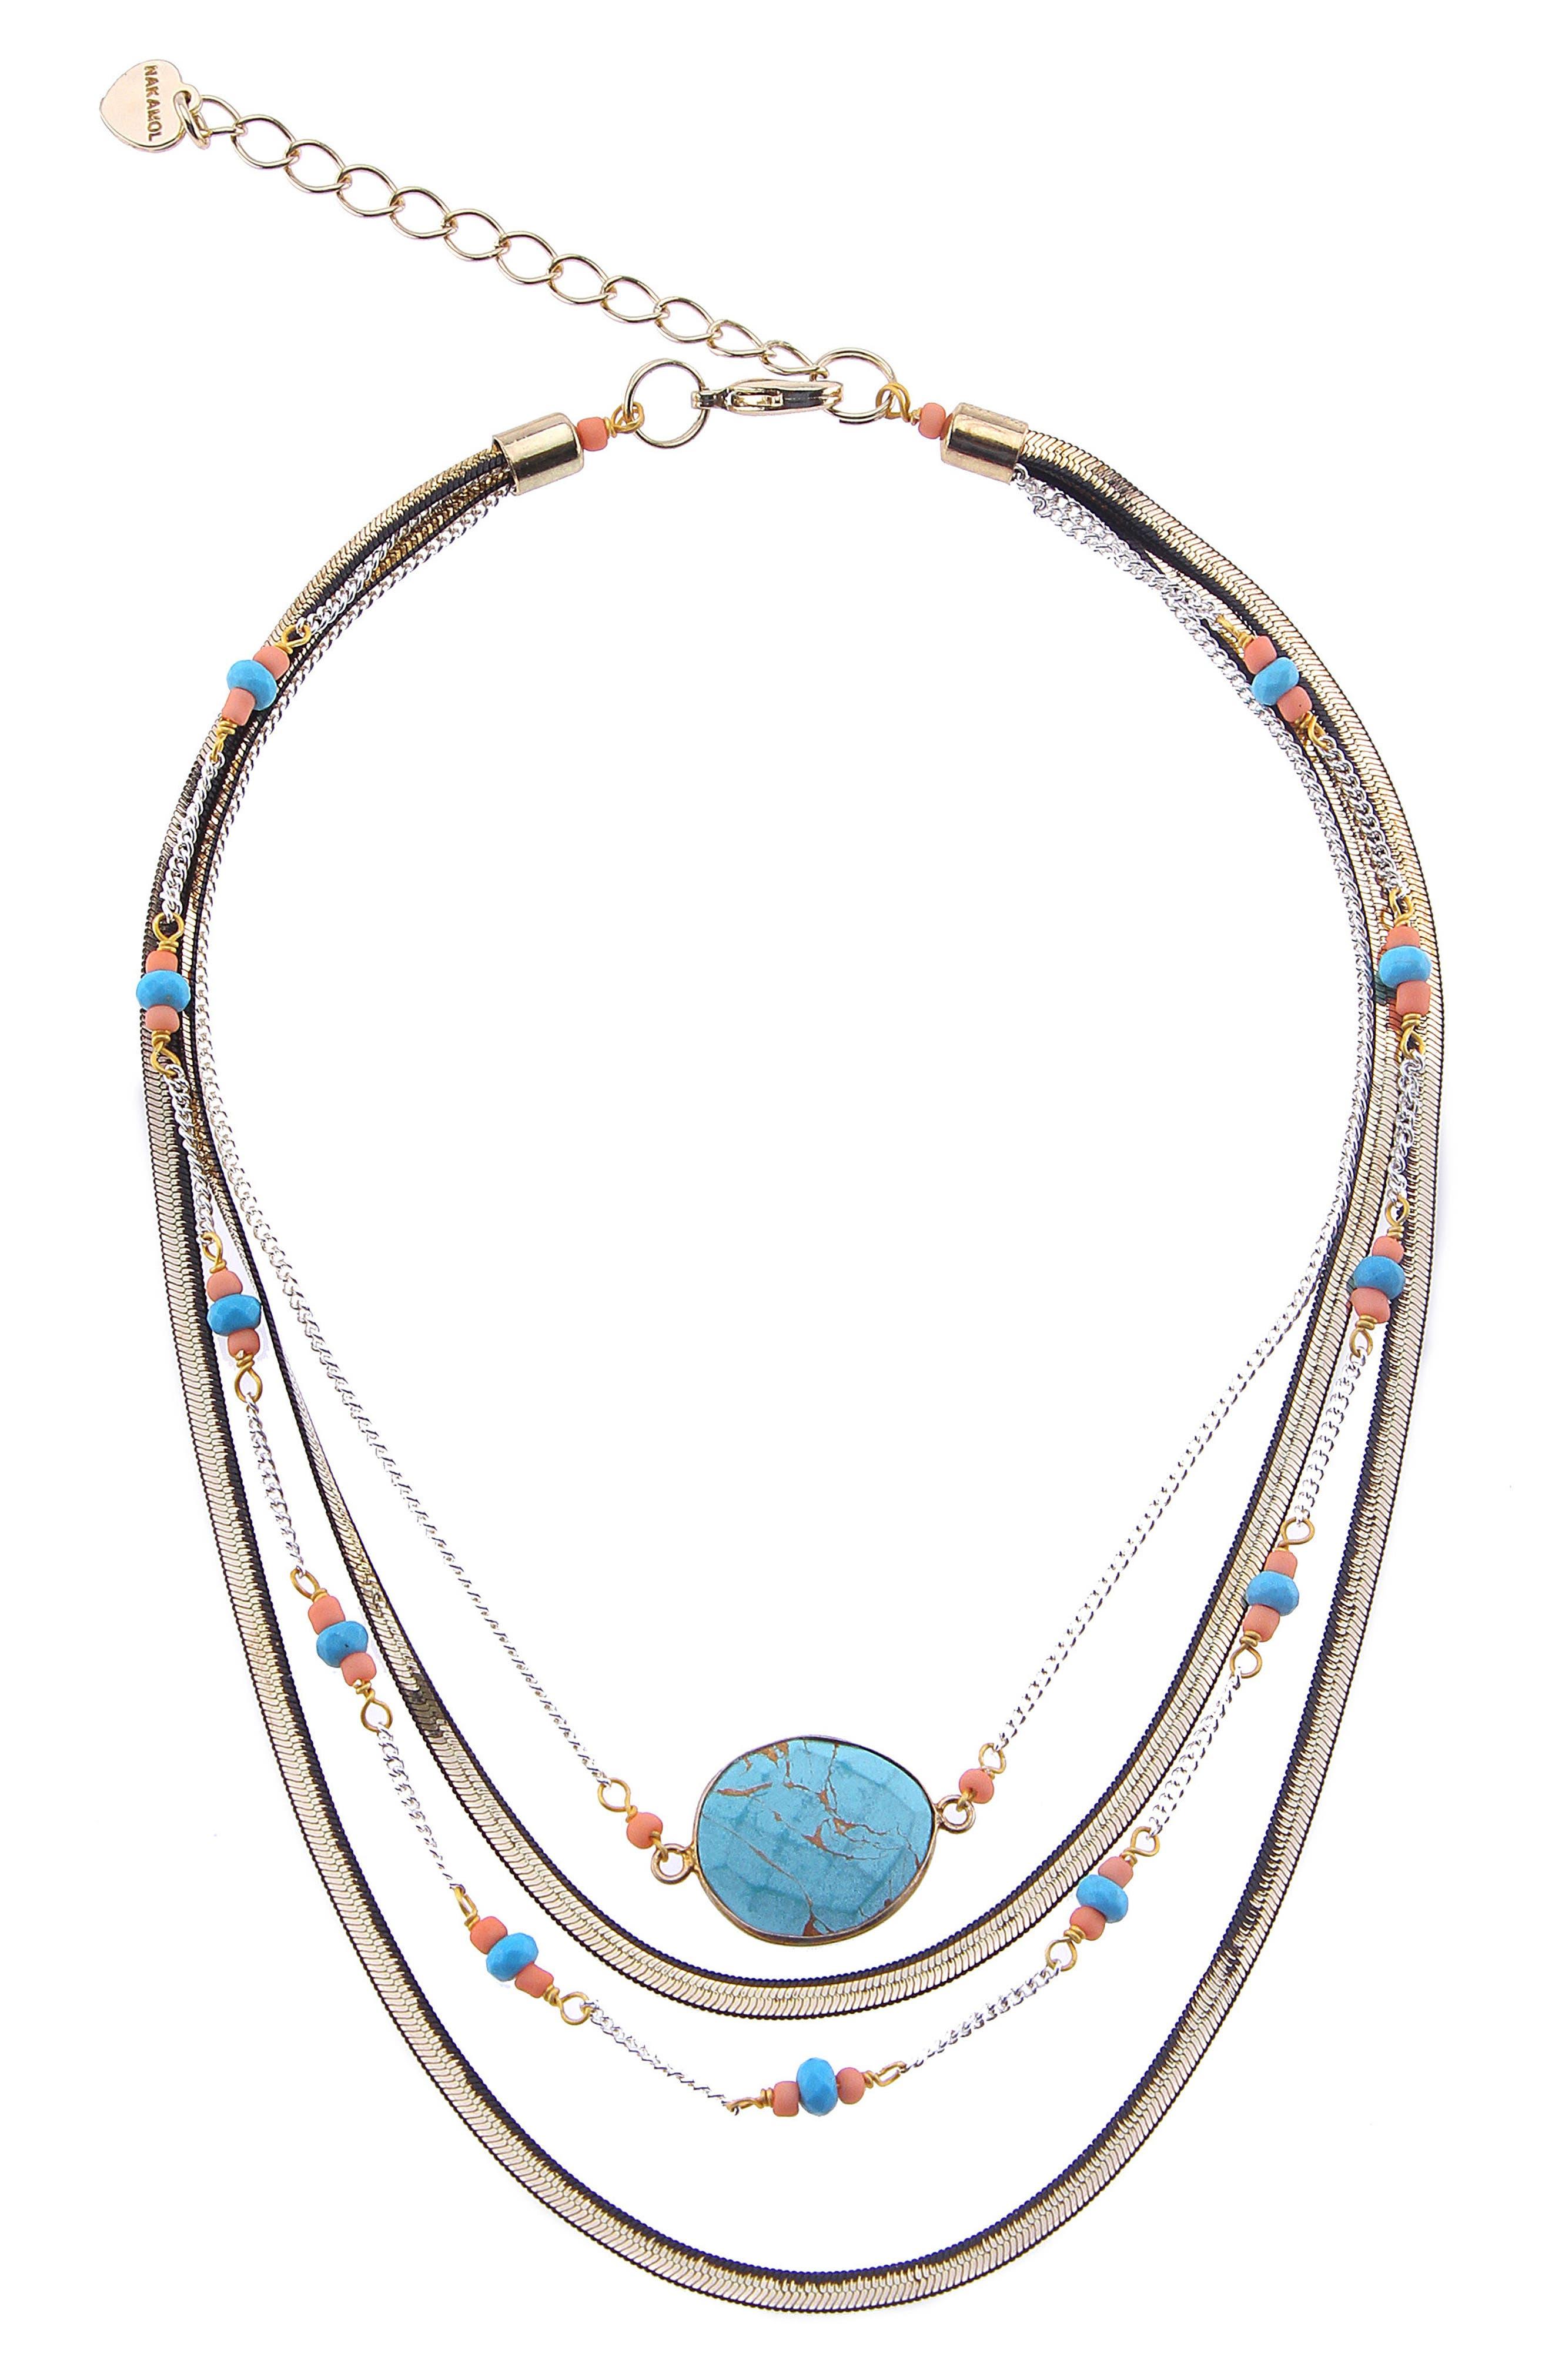 Short Multilayer Howlite & Agate Necklace,                             Main thumbnail 1, color,                             410